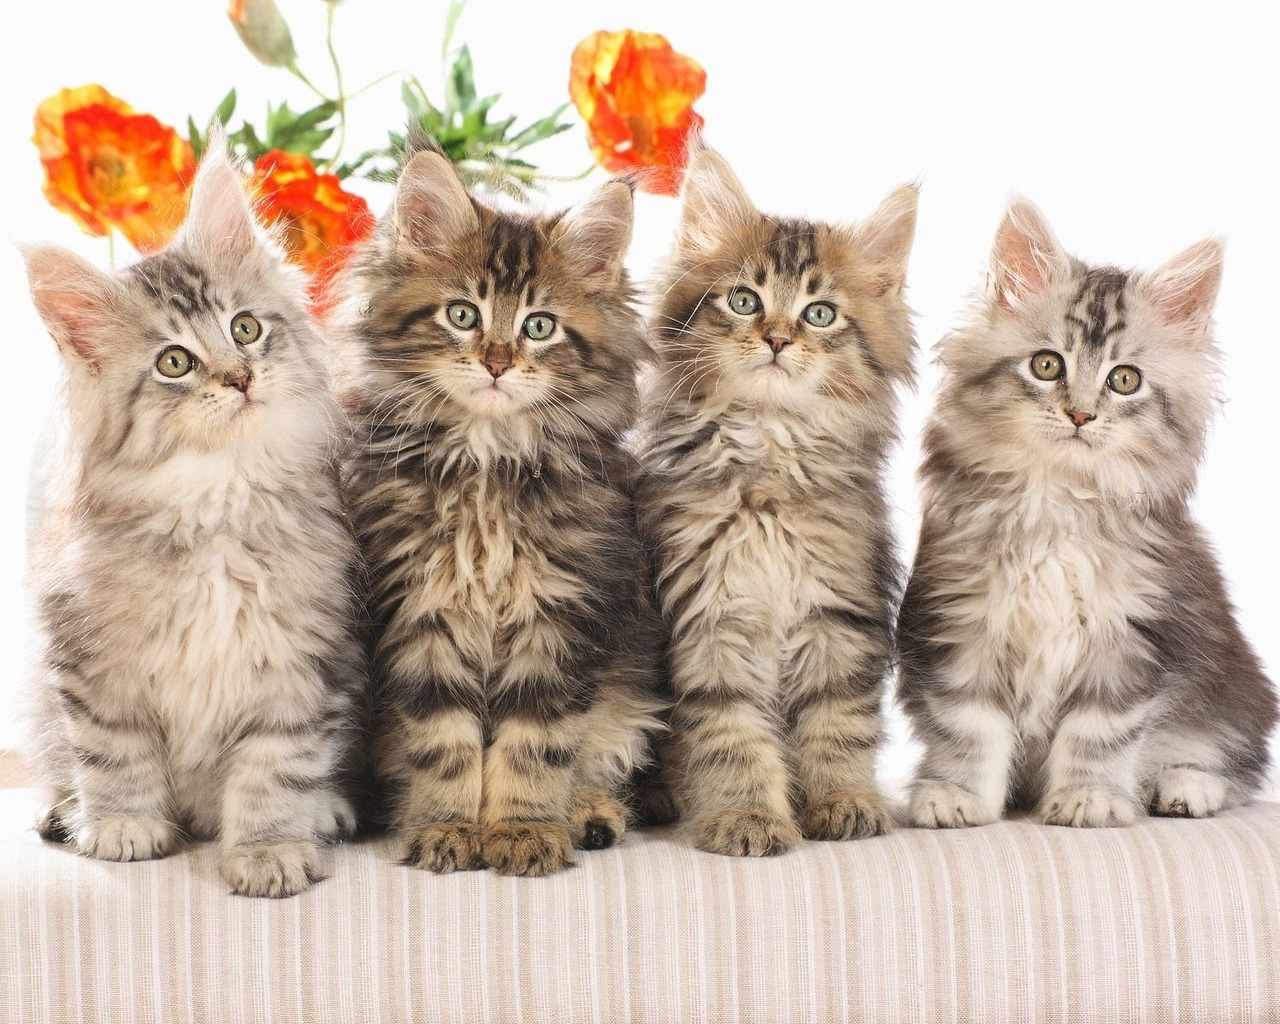 cat wallpaper widescreen for dekstop | cat wallpaper